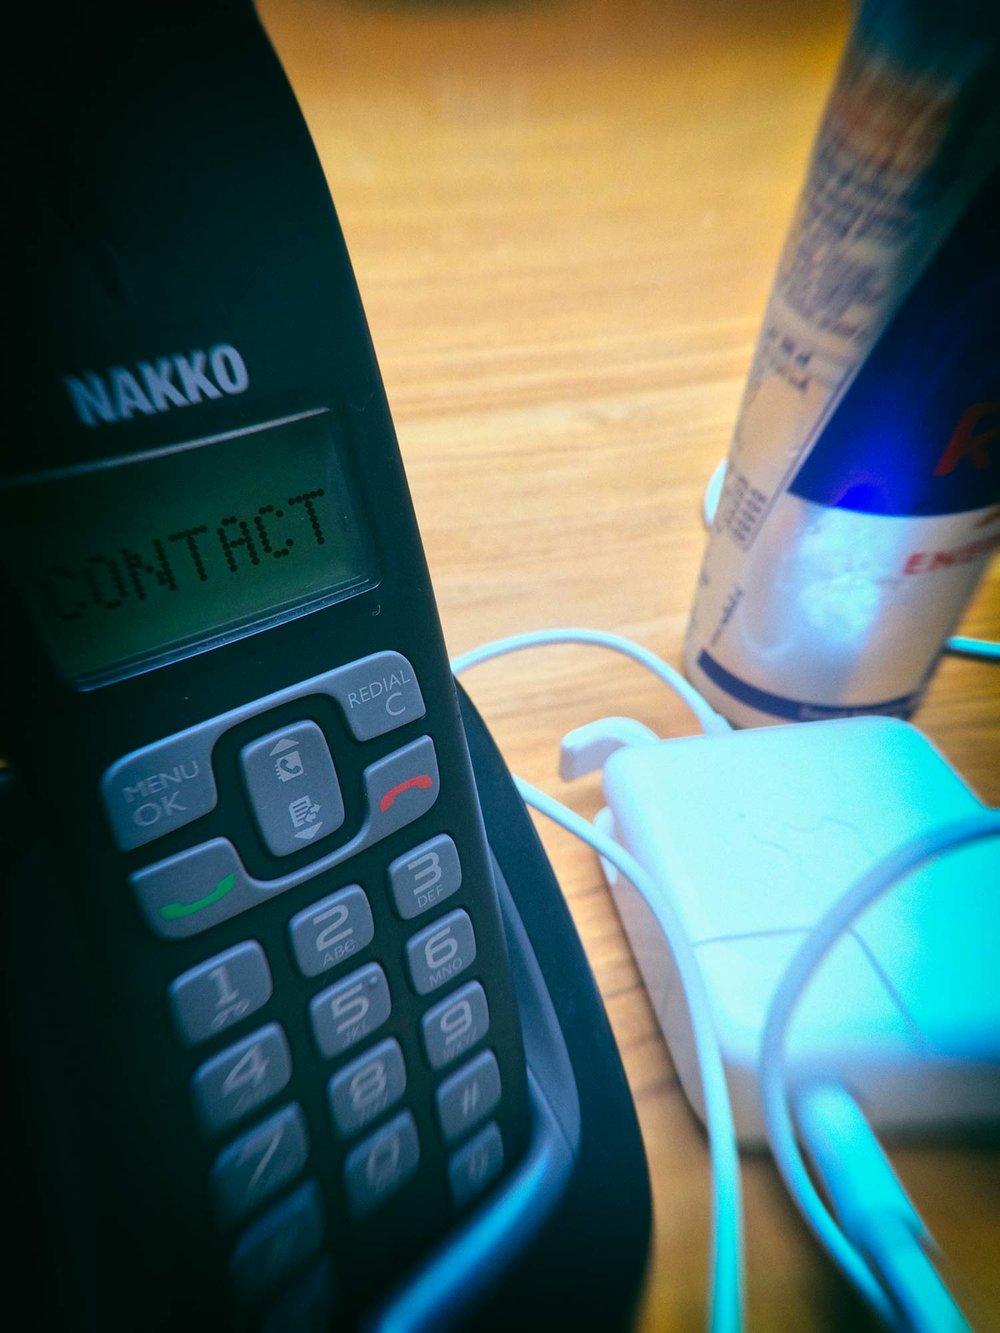 CONTACT-NAK.jpg